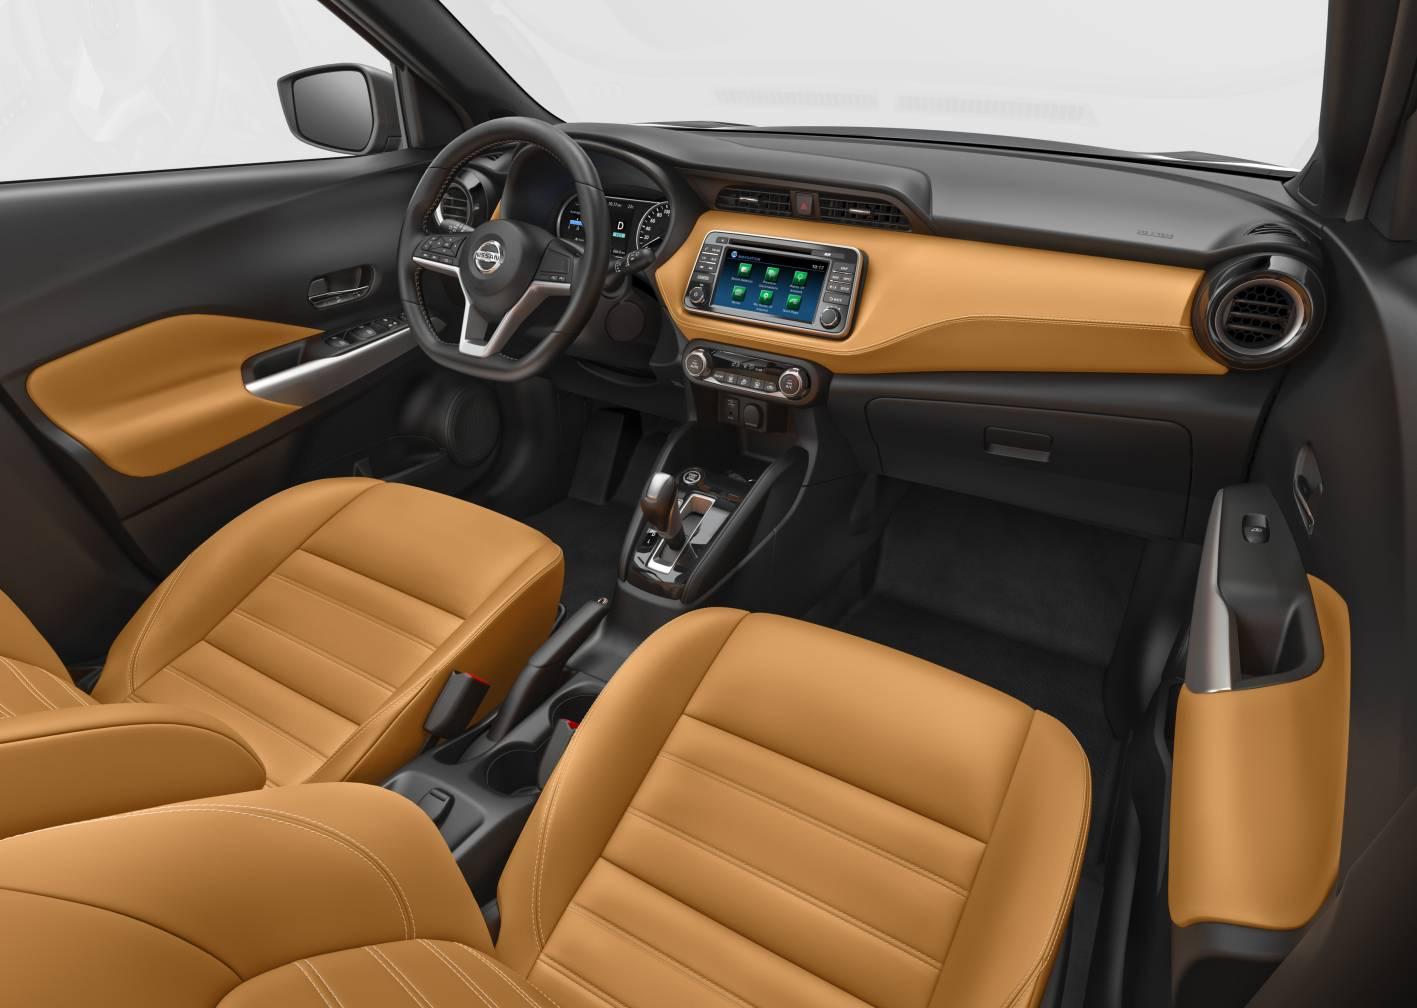 Nissan Juke 2019 >> Nissan News: Nissan Kicks compact crossover goes into production